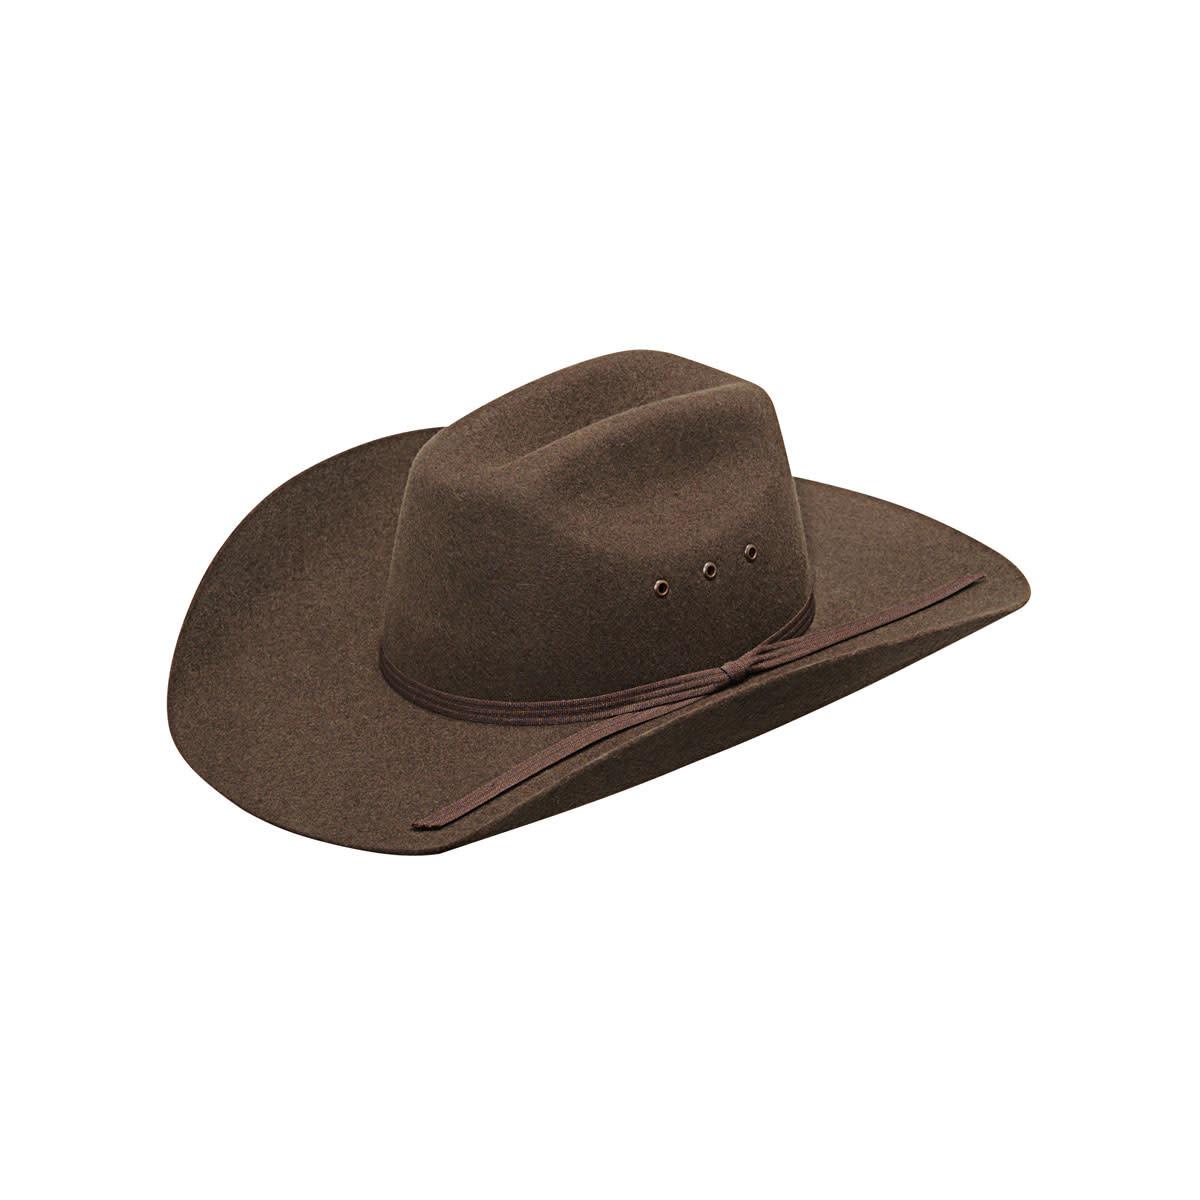 Twister Youth Wool Felt Hats